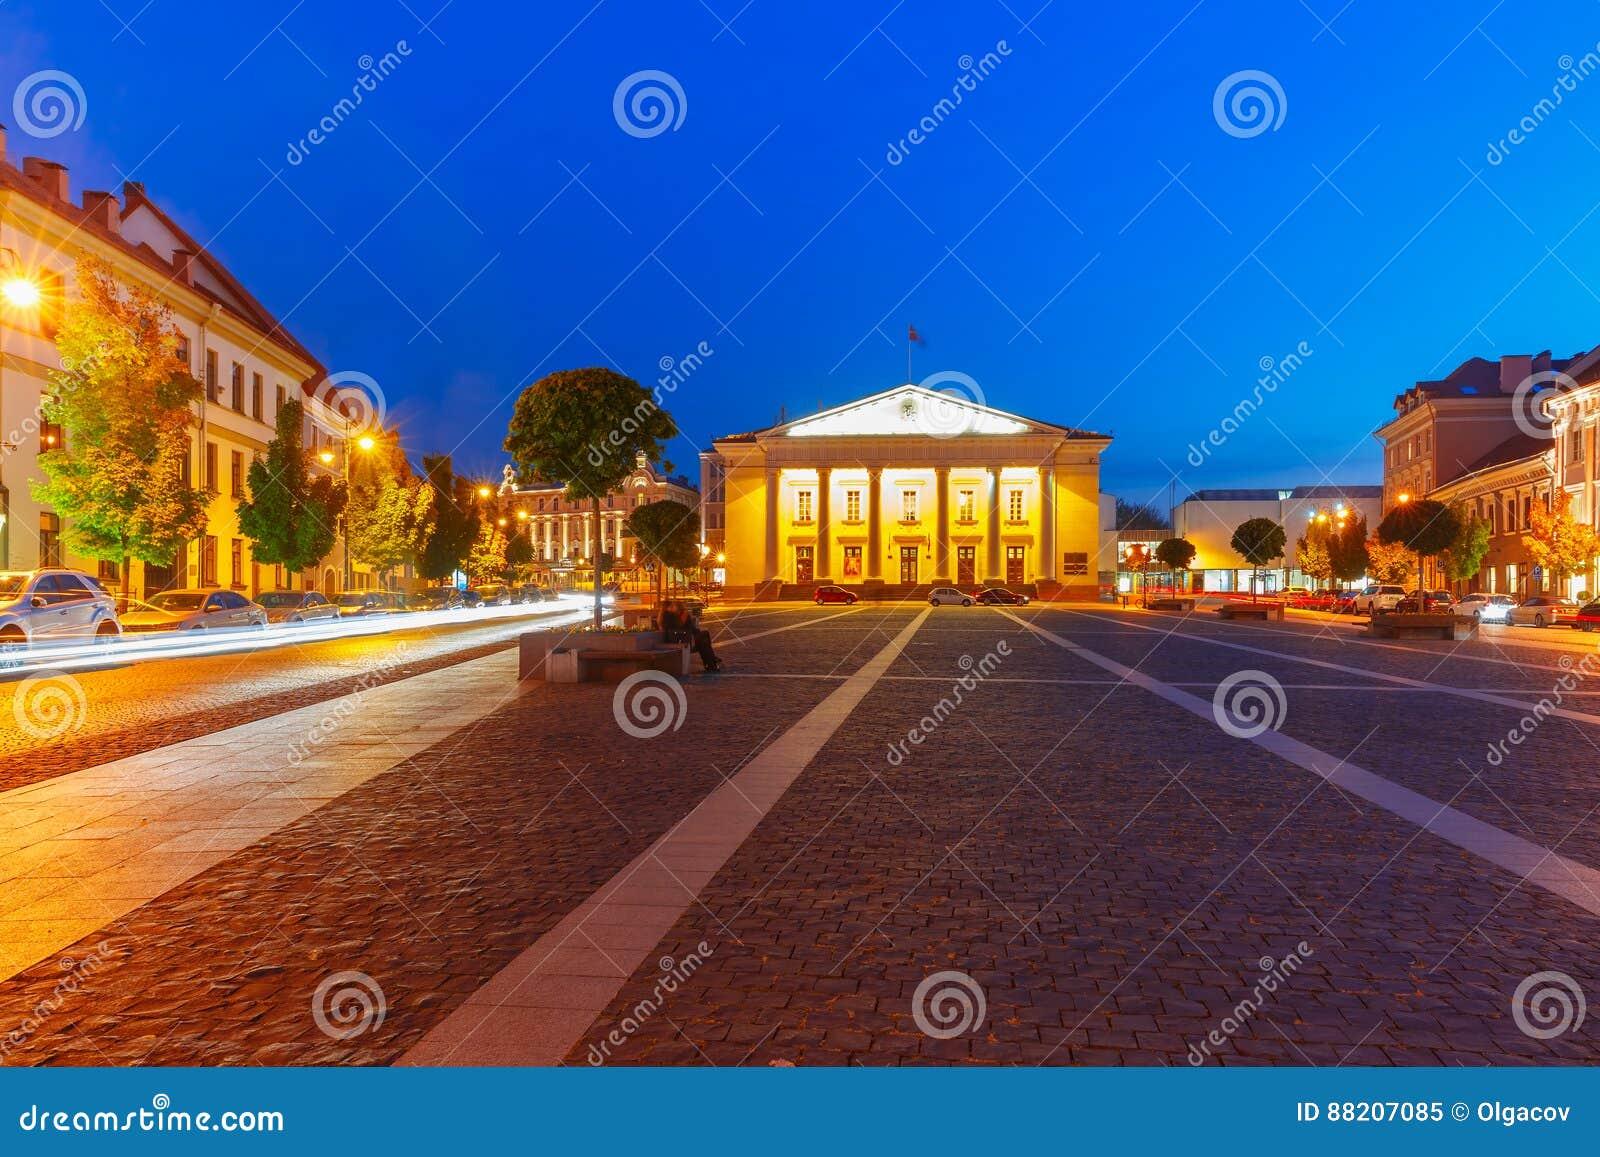 Stad Hall Square bij nacht, Vilnius, Litouwen